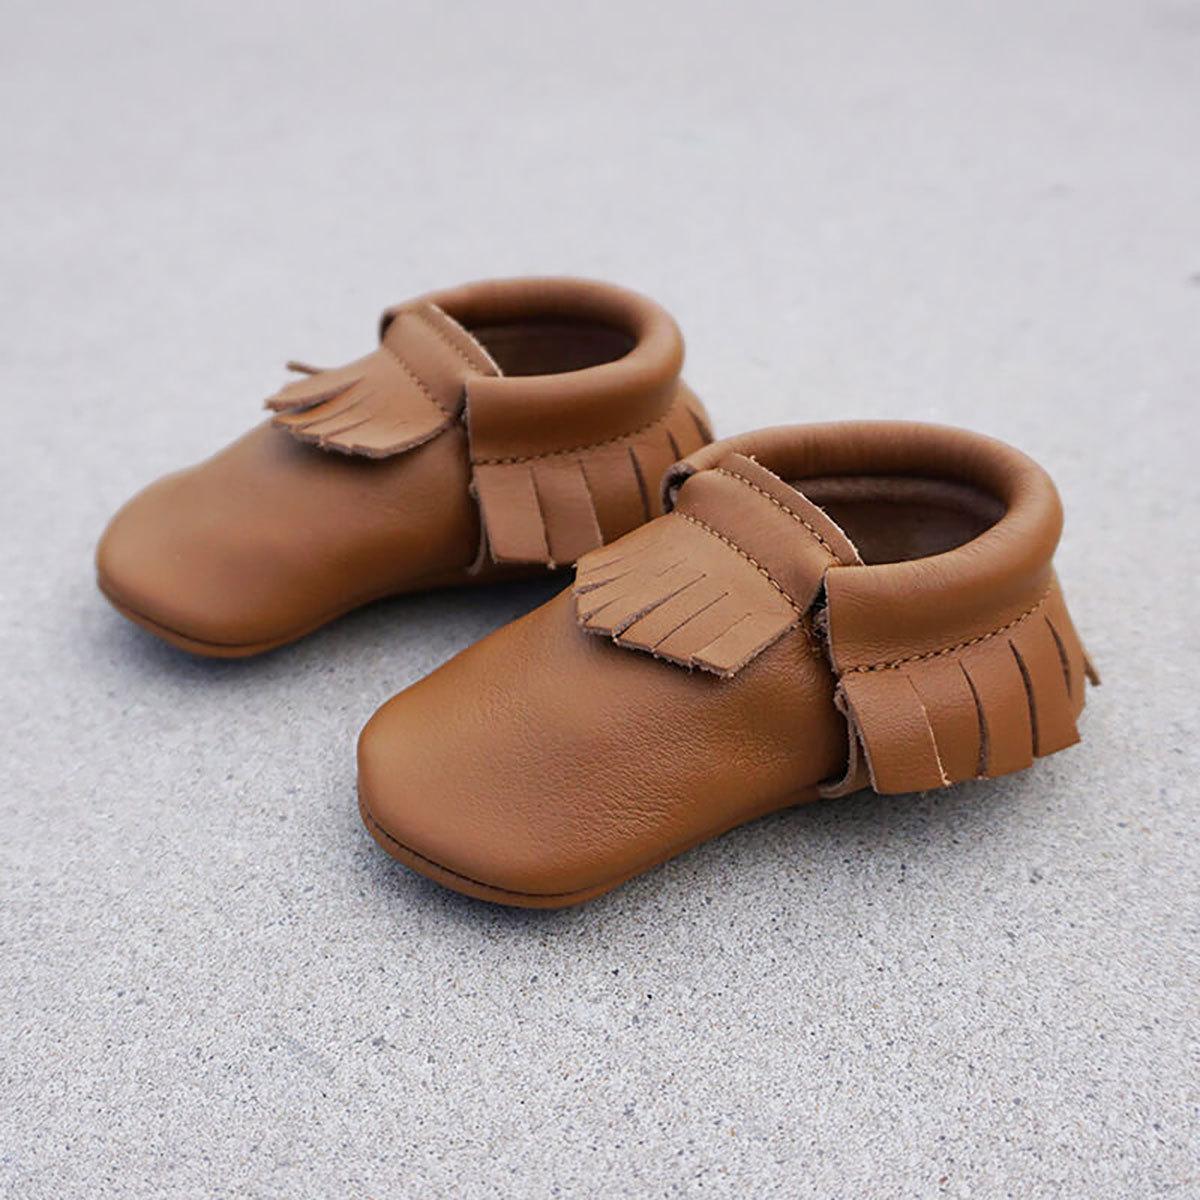 Chaussons & Chaussures Mocassins - Camel - 6/12 Mois Mocassins - Camel - 6/12 Mois